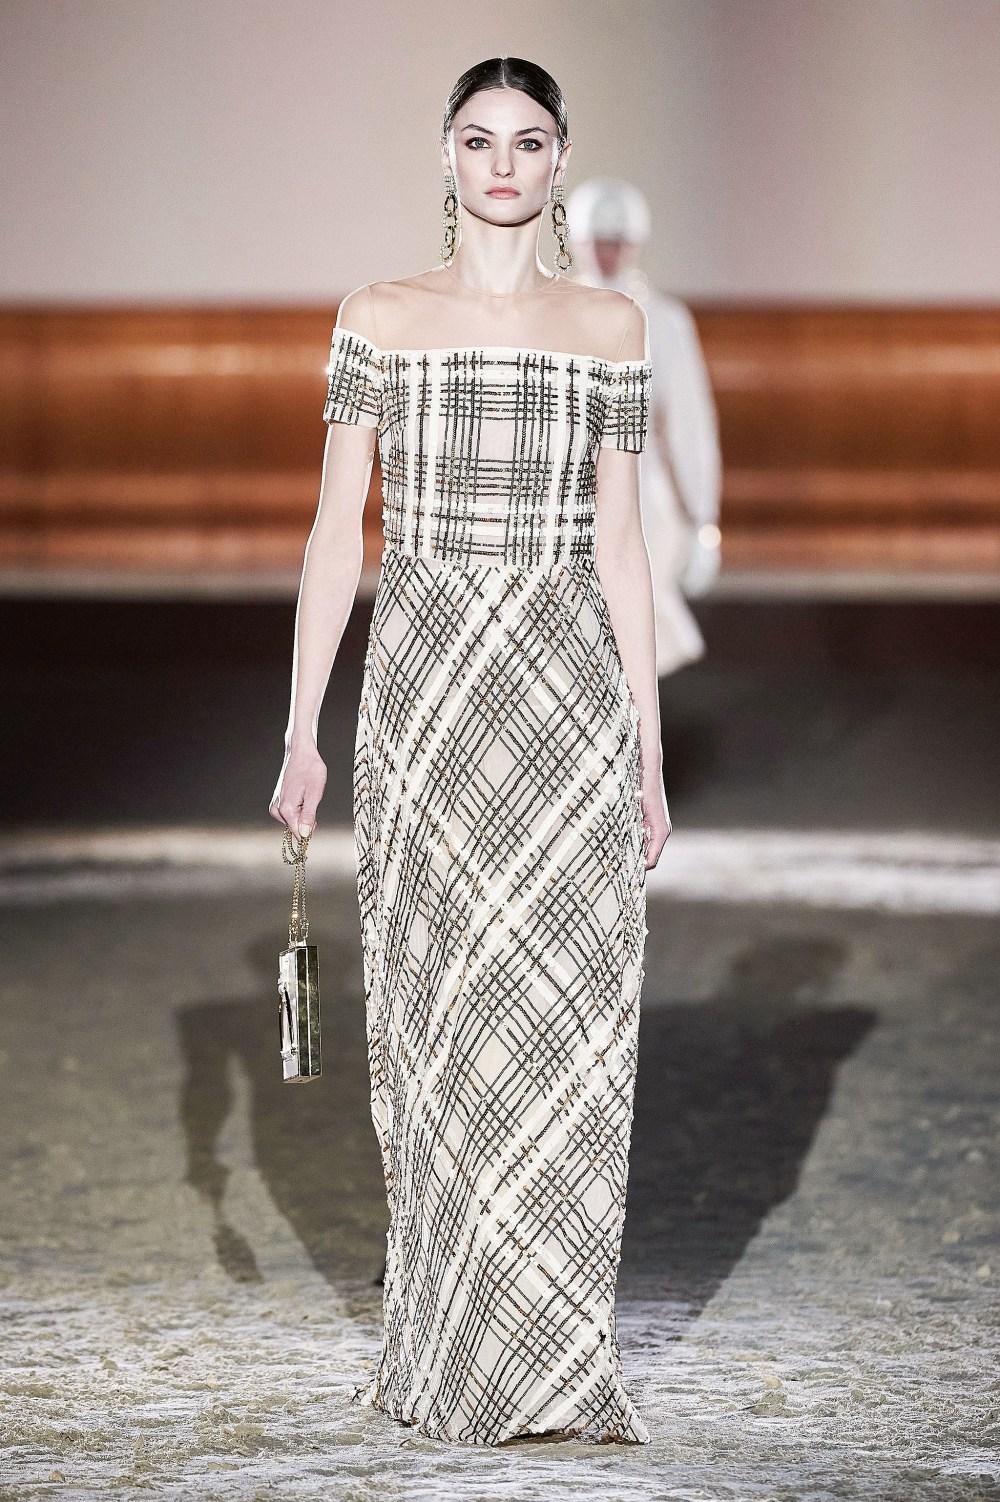 Elisabetta Franchi: Elisabetta Franchi Fall Winter 2021-22 Fashion Show Photo #50